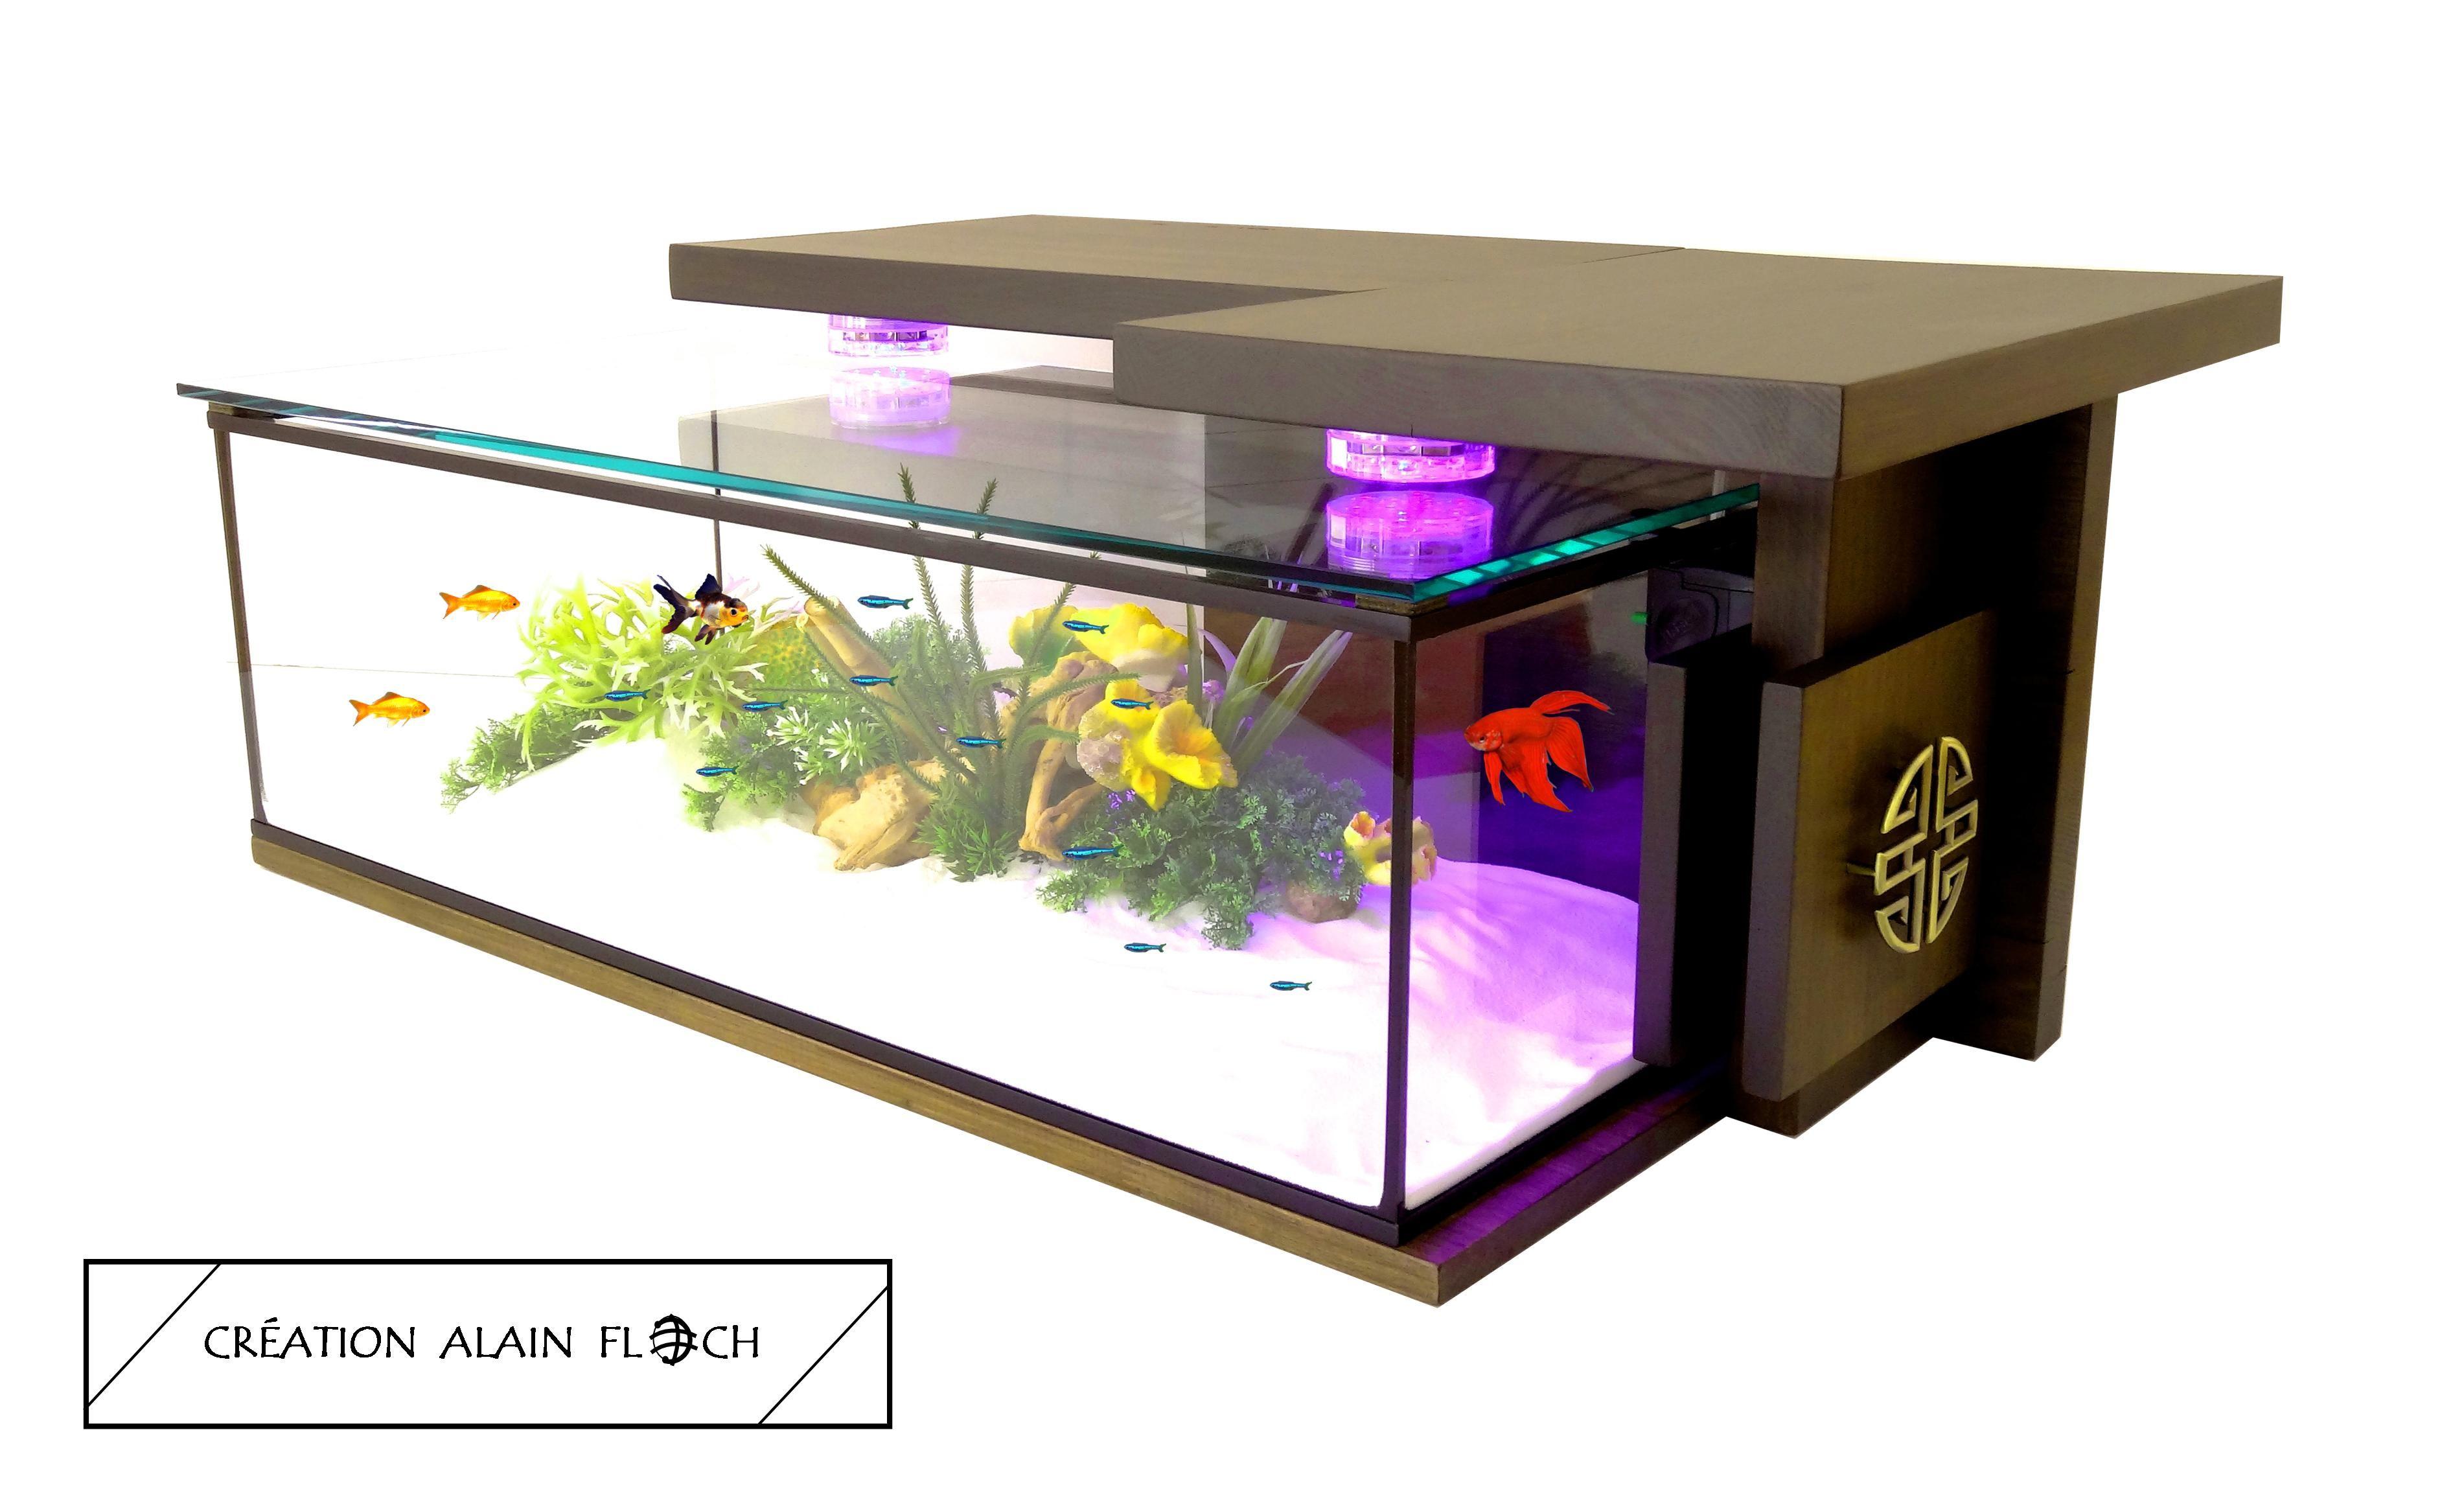 Table Basse Monastik Avec Aquarium Et Sculpture En Zinc Table Basse Aquarium Table Basse Contemporaine Table Basse